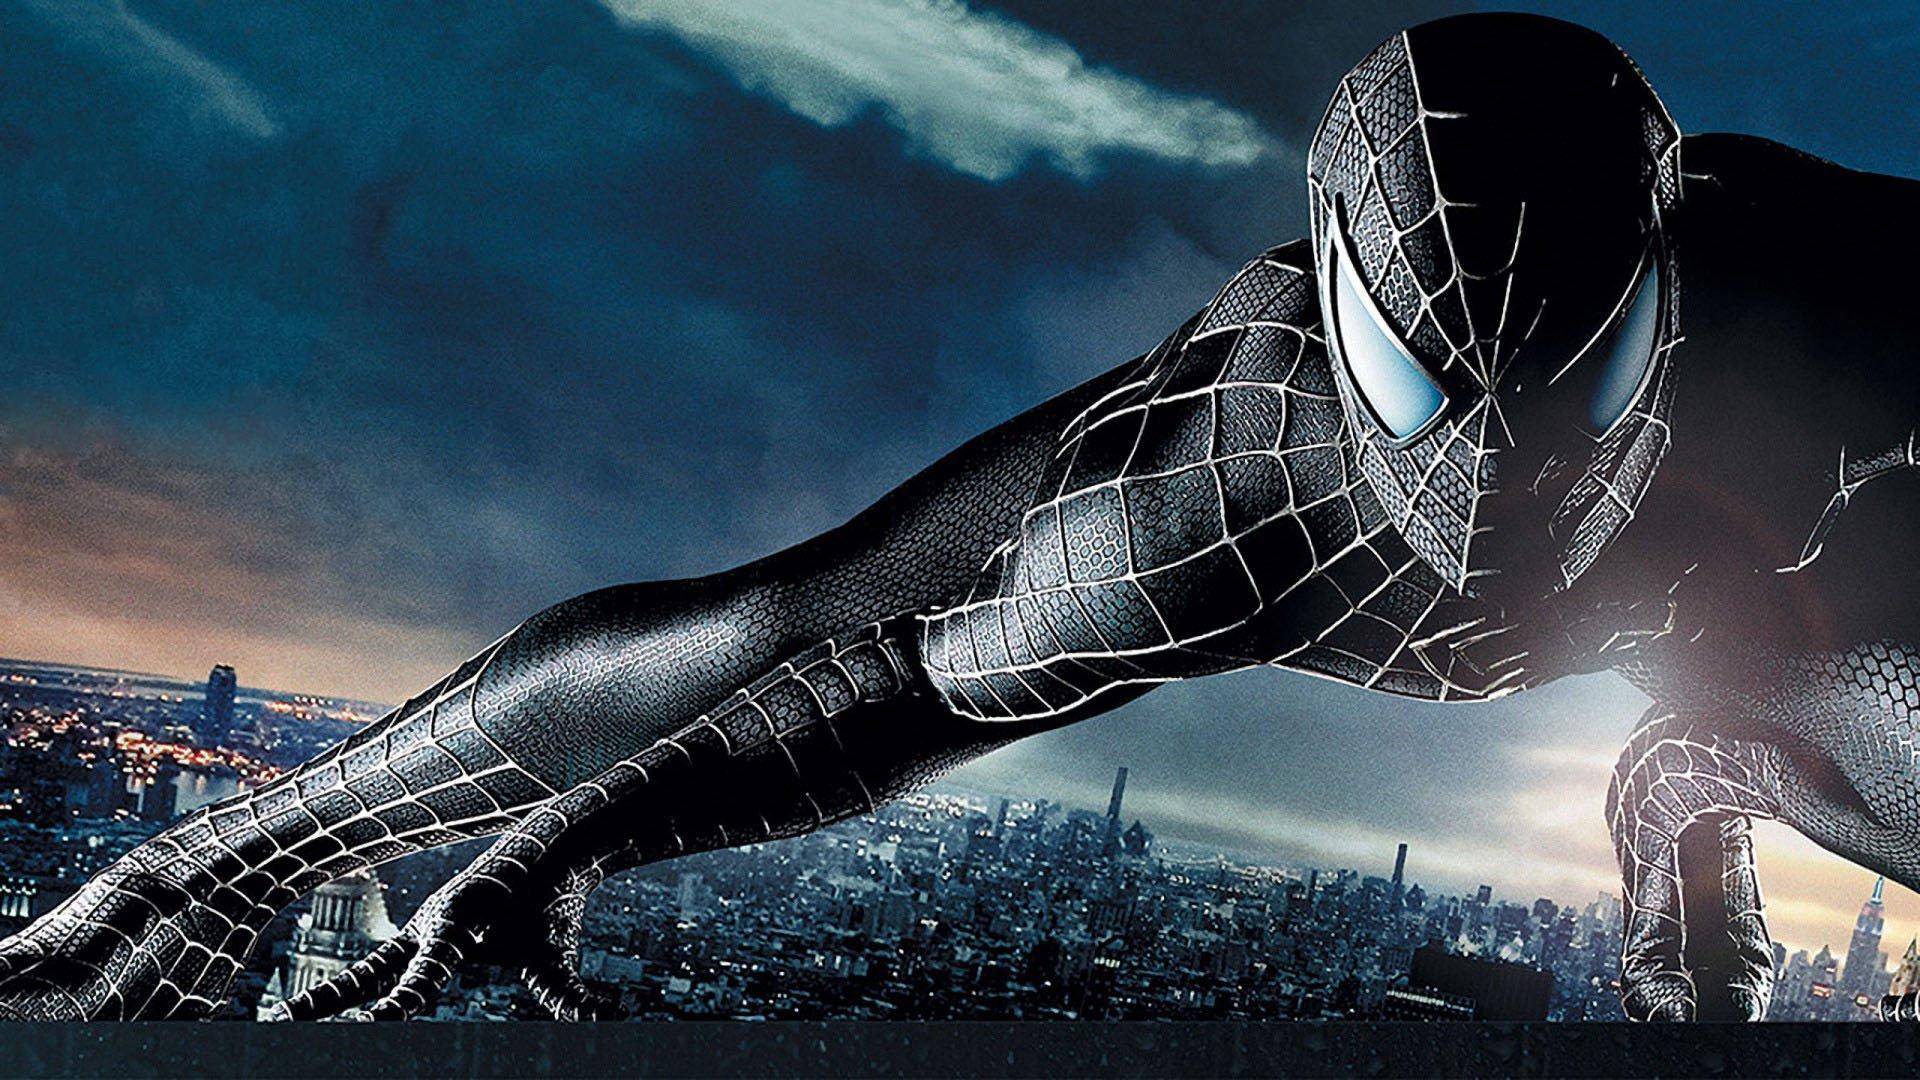 Spider-Man HD Wallpaper